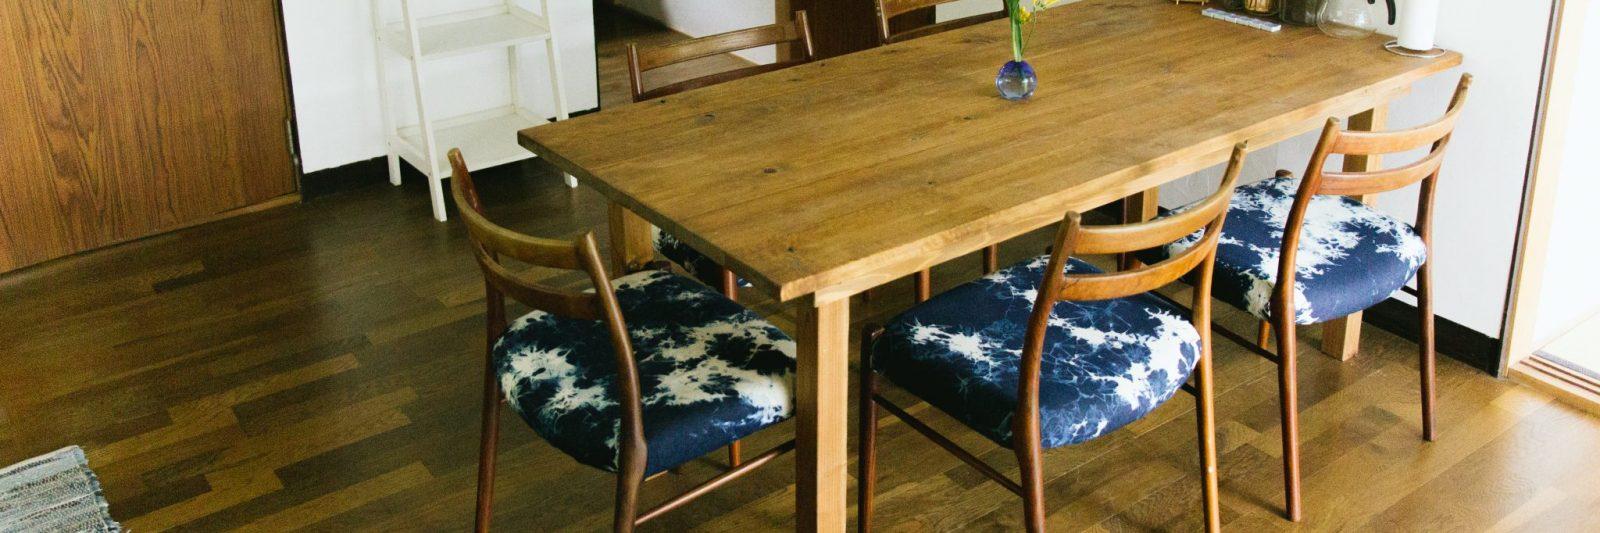 Dining table at Coya Cottage Shimoda